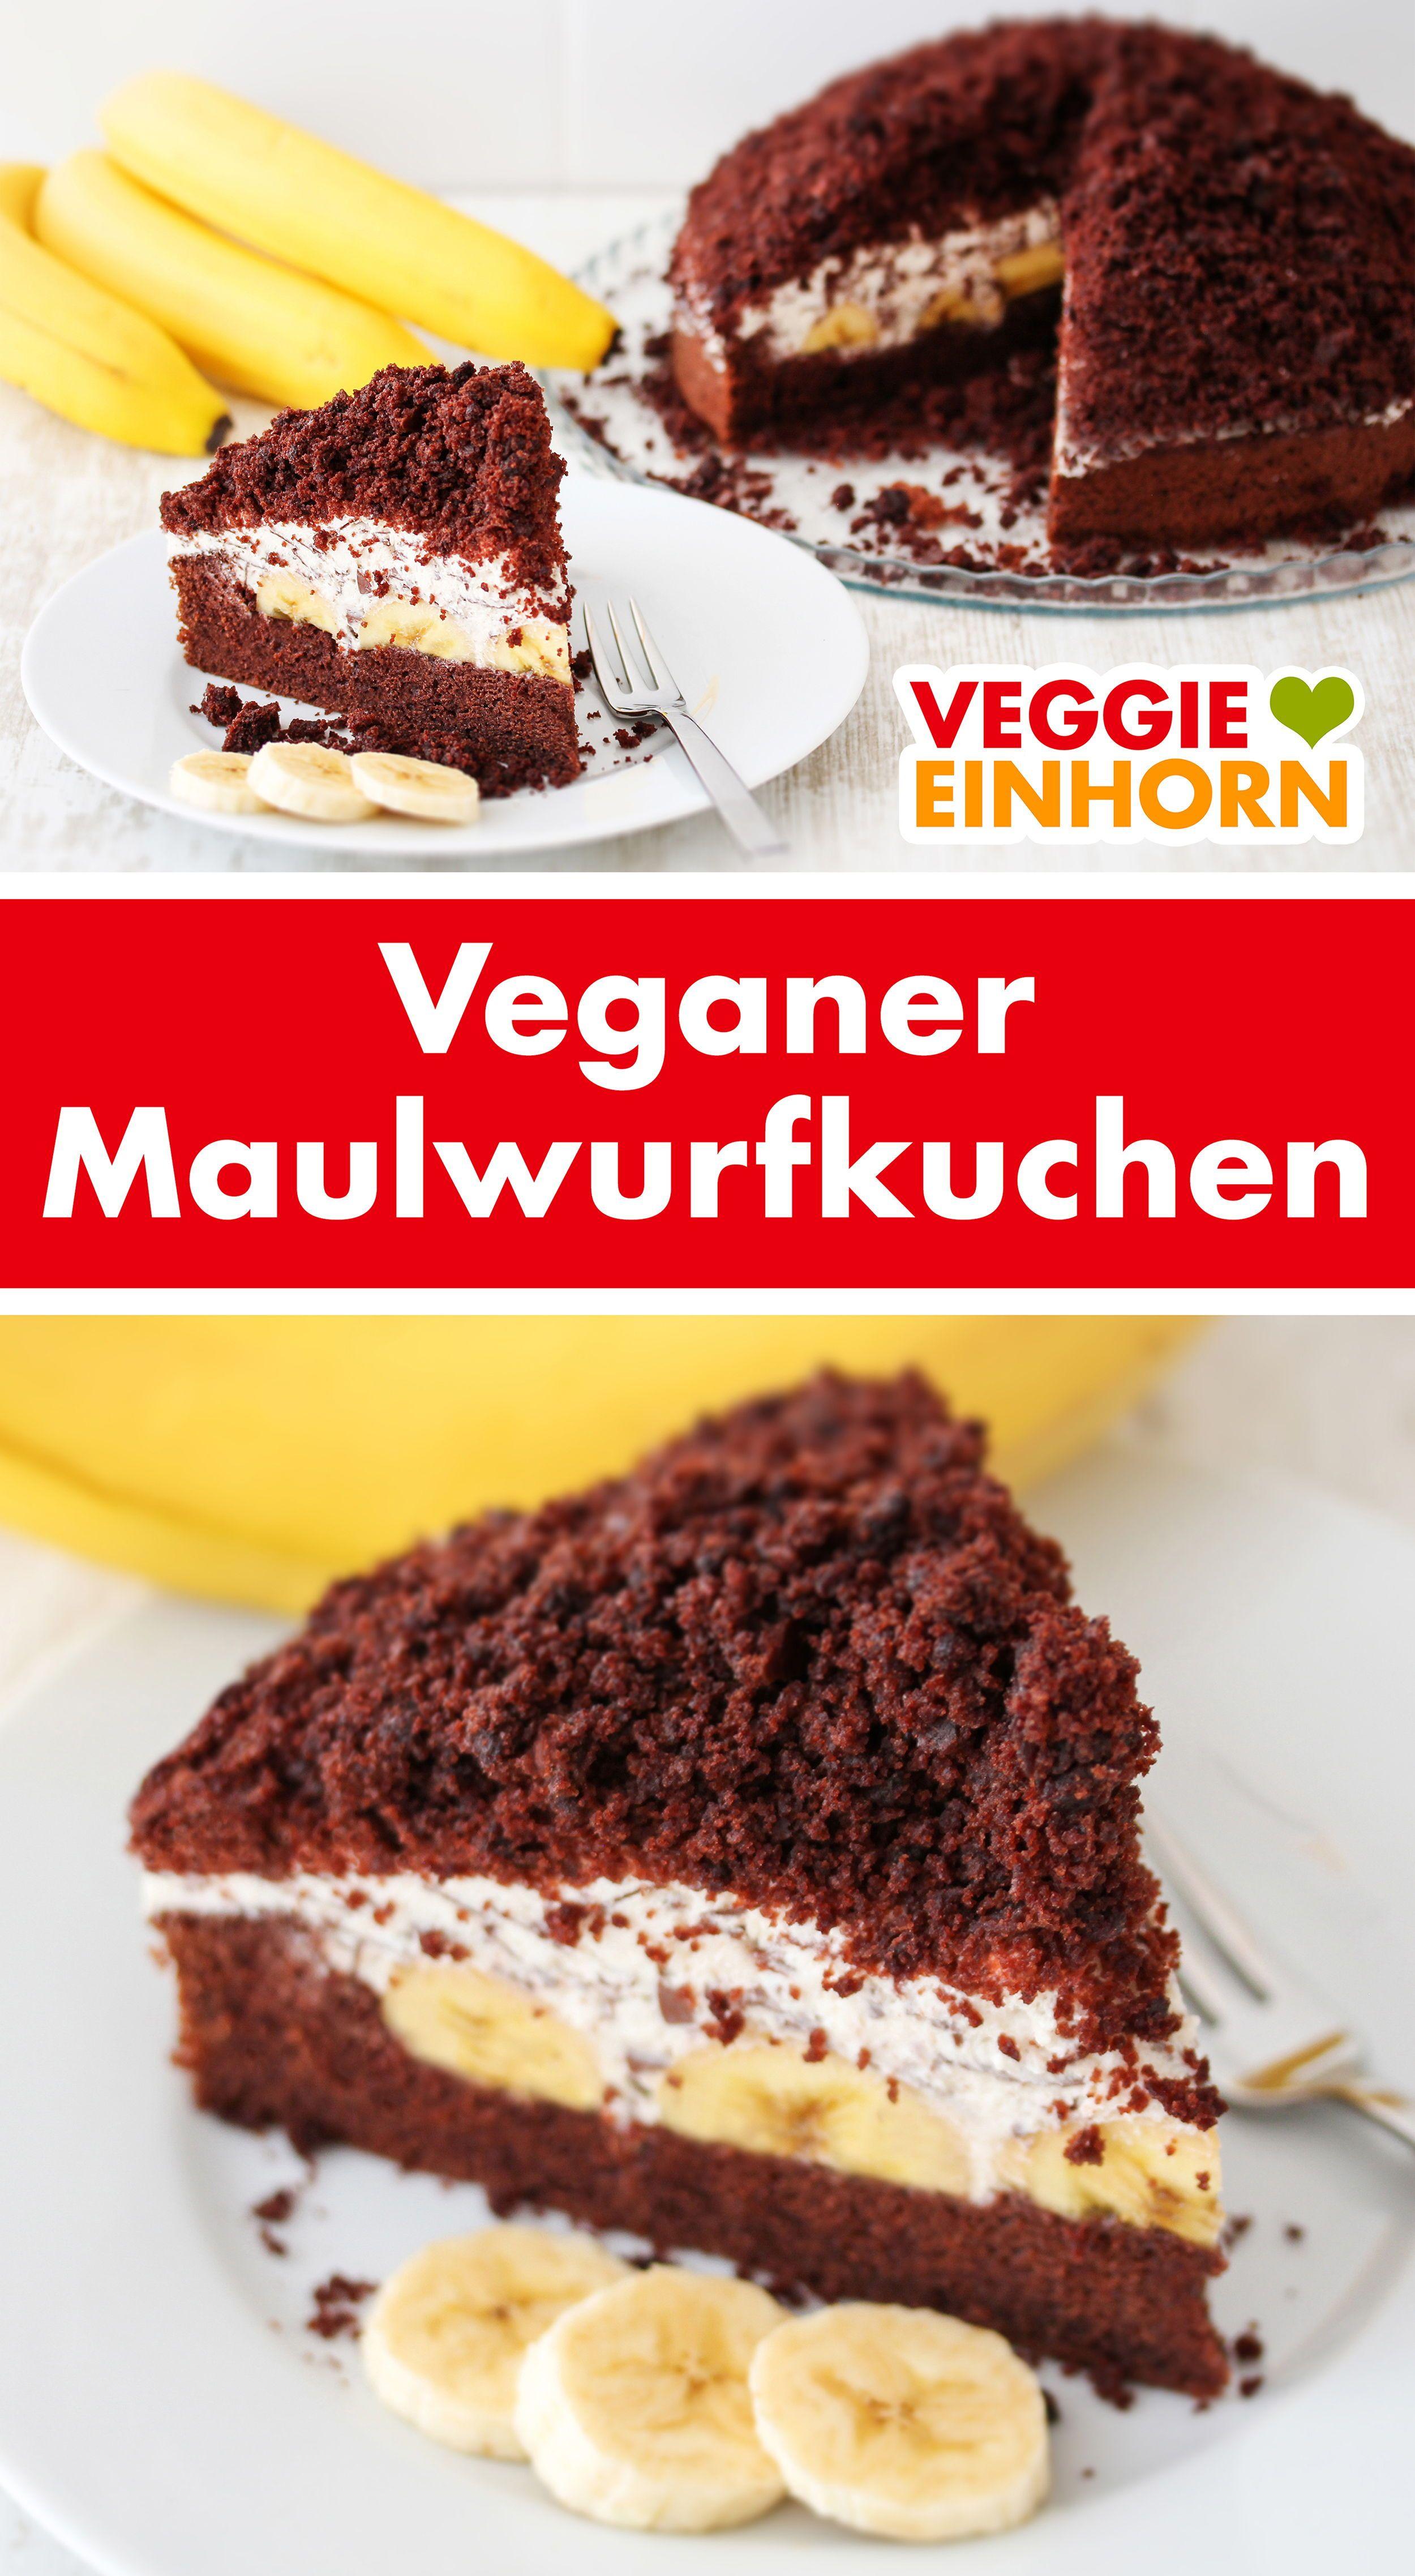 Veganer Maulwurfkuchen | Veganer Kuchen | Einfaches Rezept zum backen